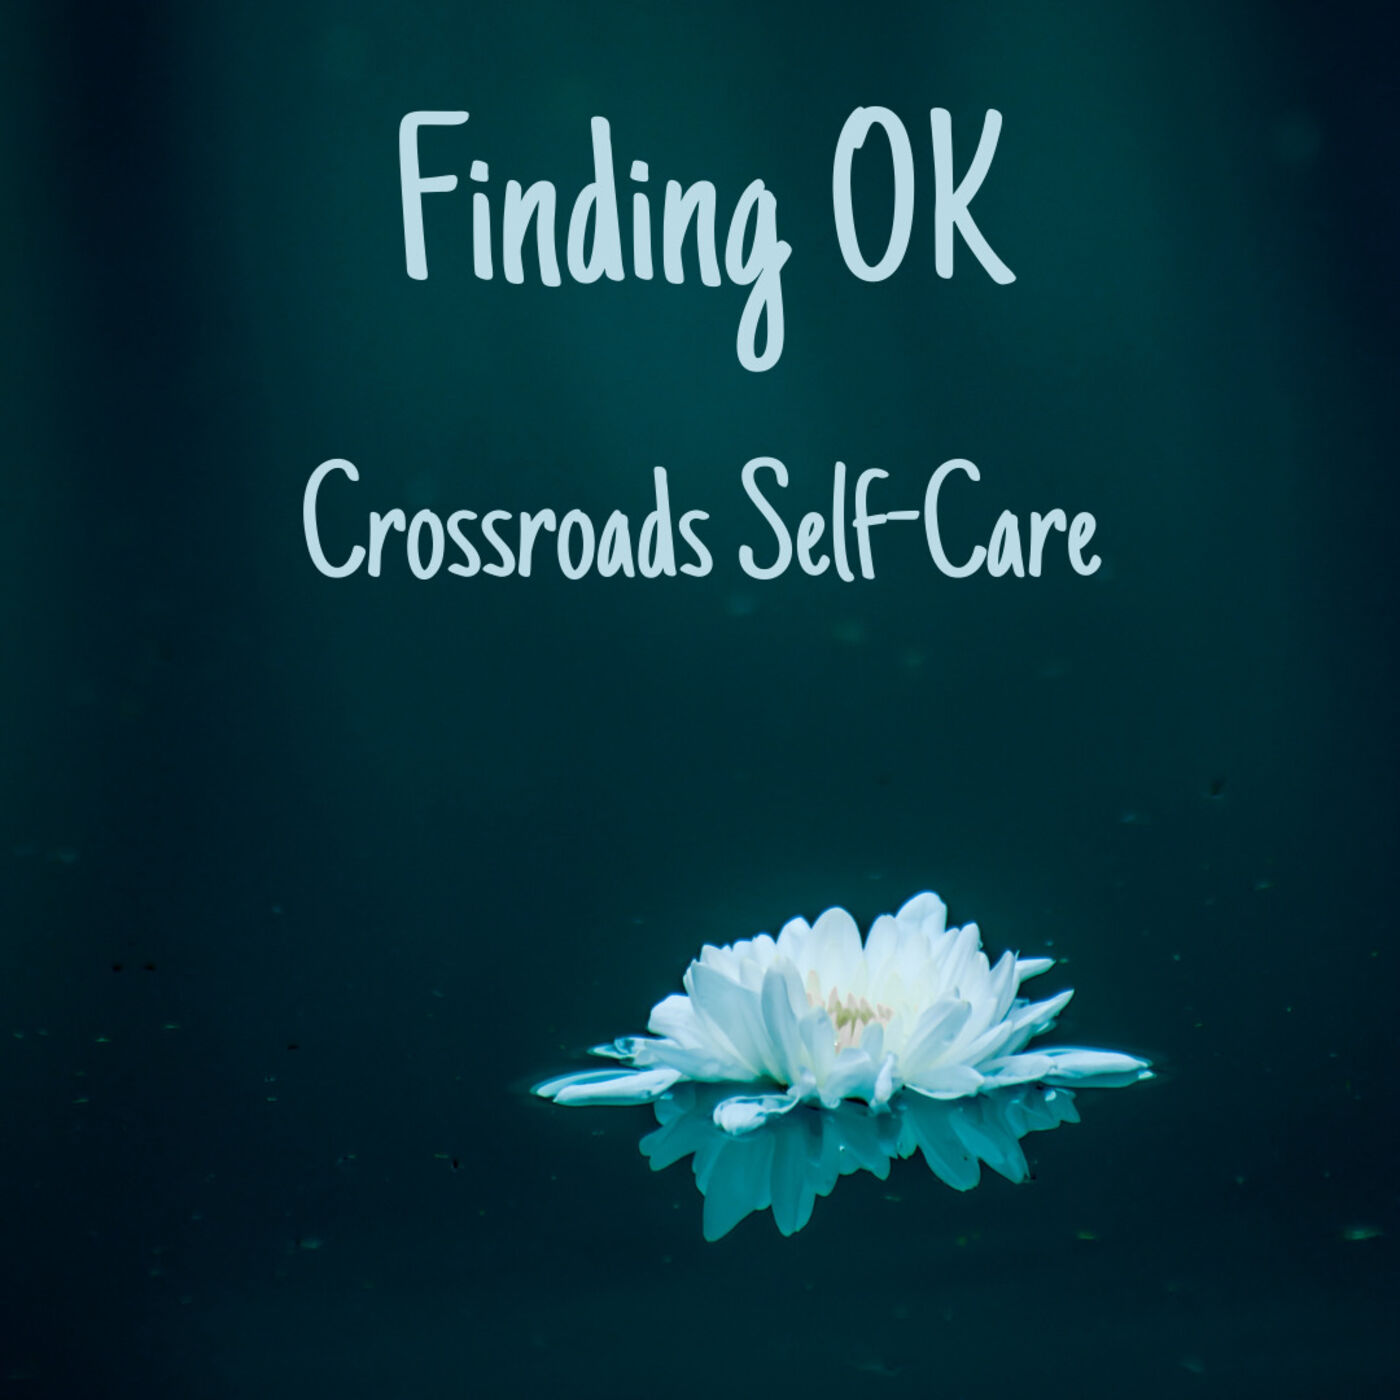 Crossroads Self-Care